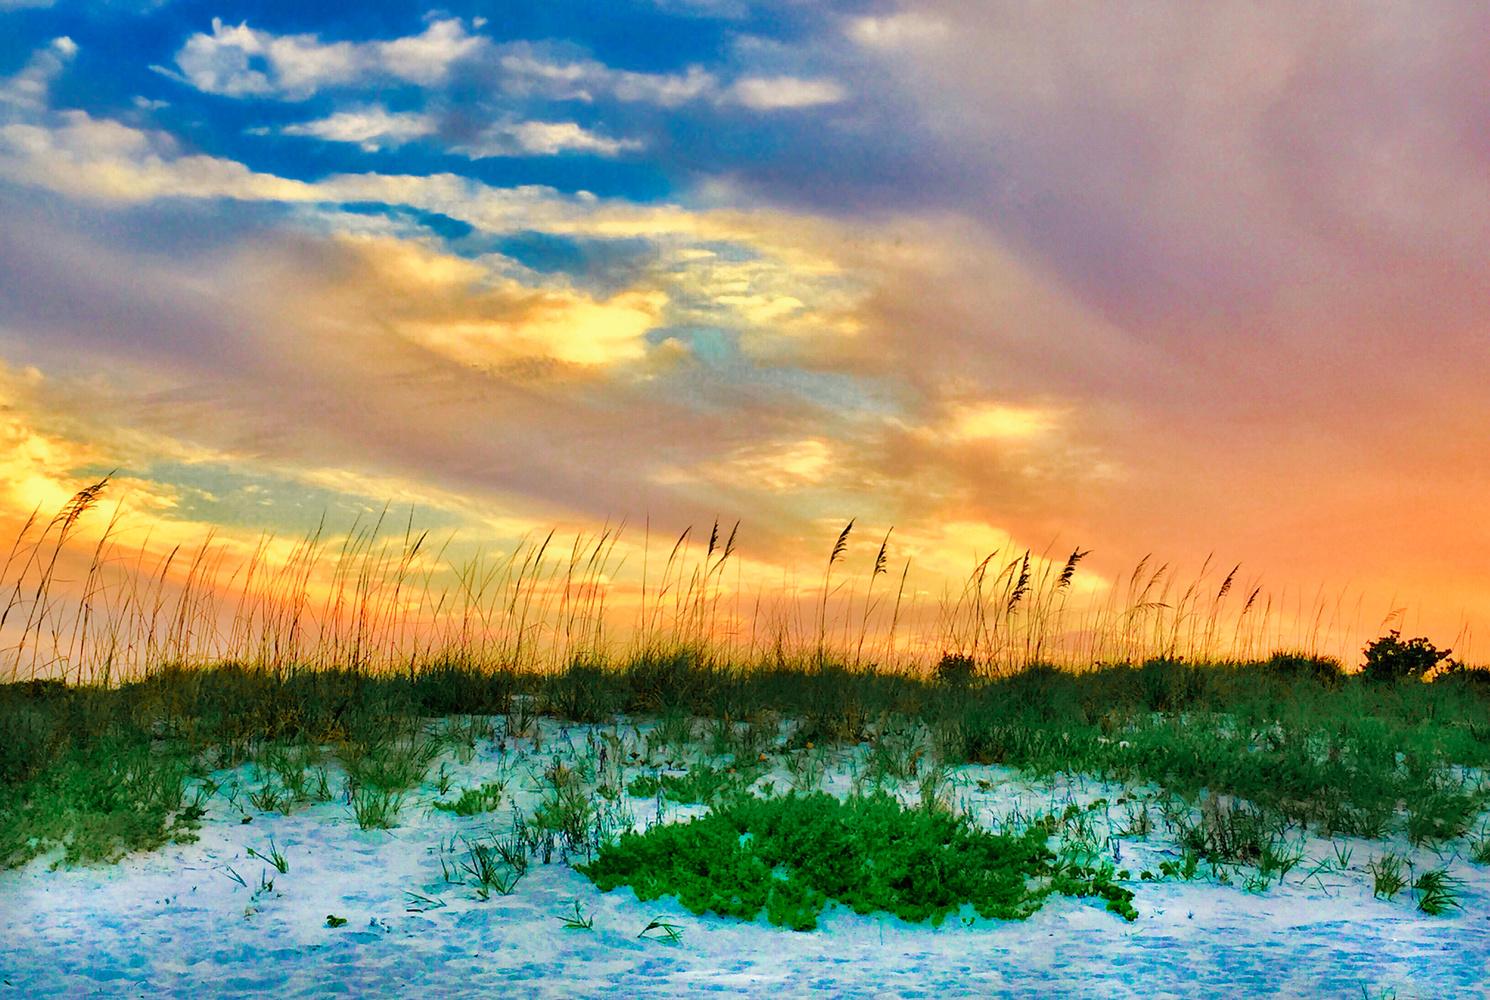 Sunset Beach by Steve Gaines